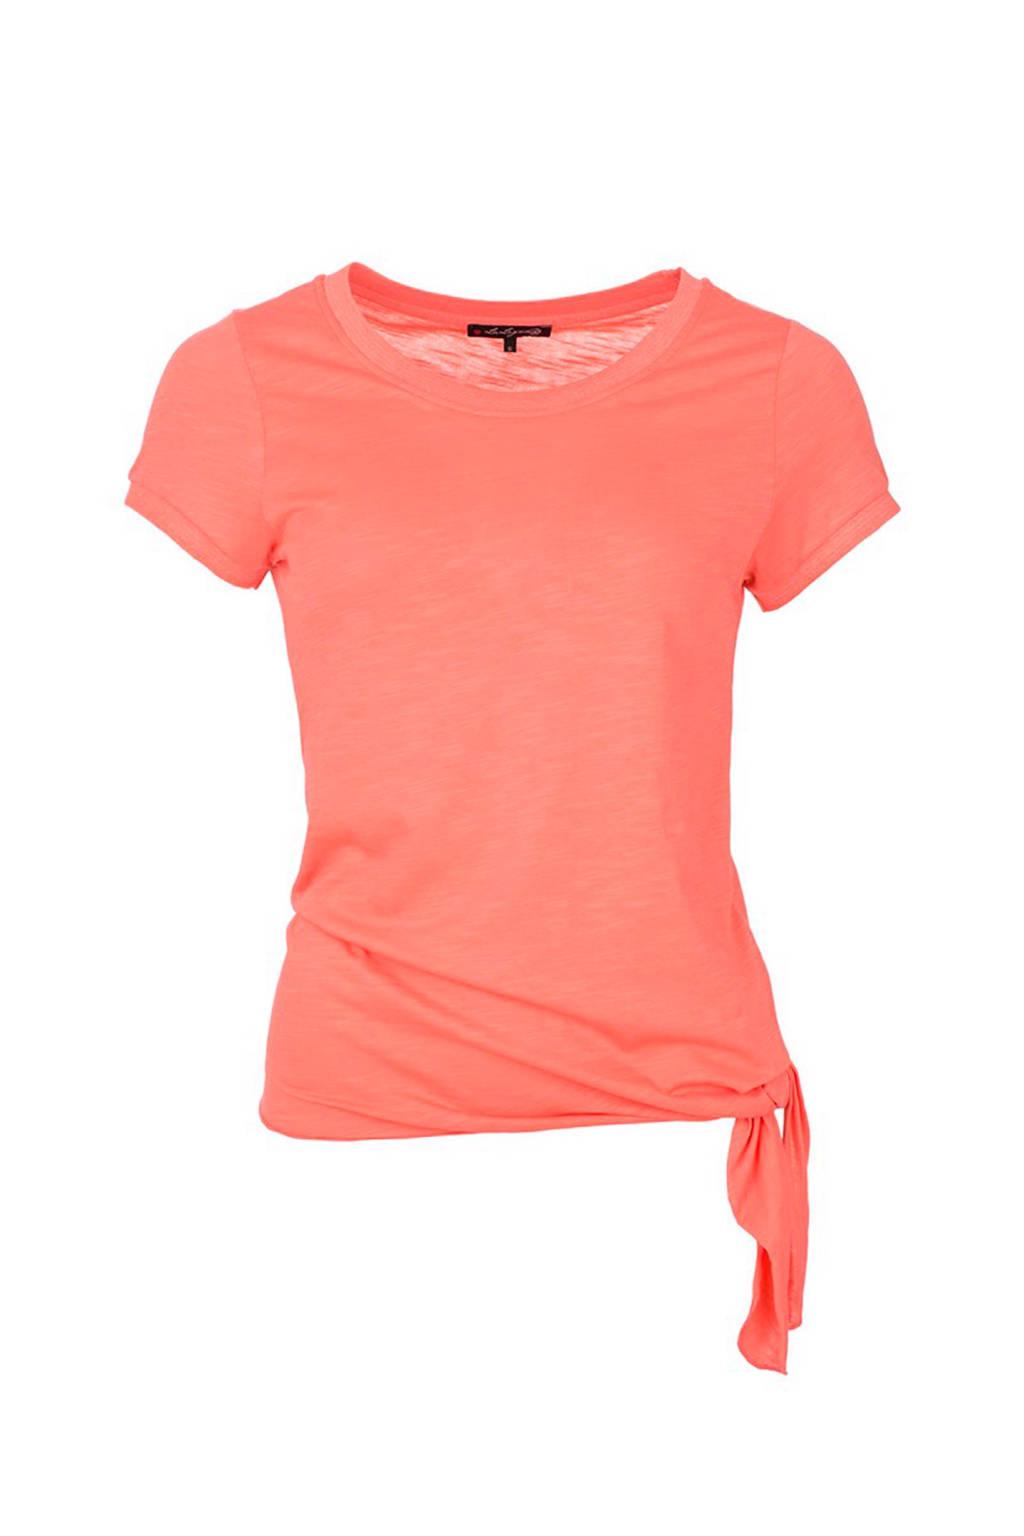 La Ligna T-shirt koraal, Koraal